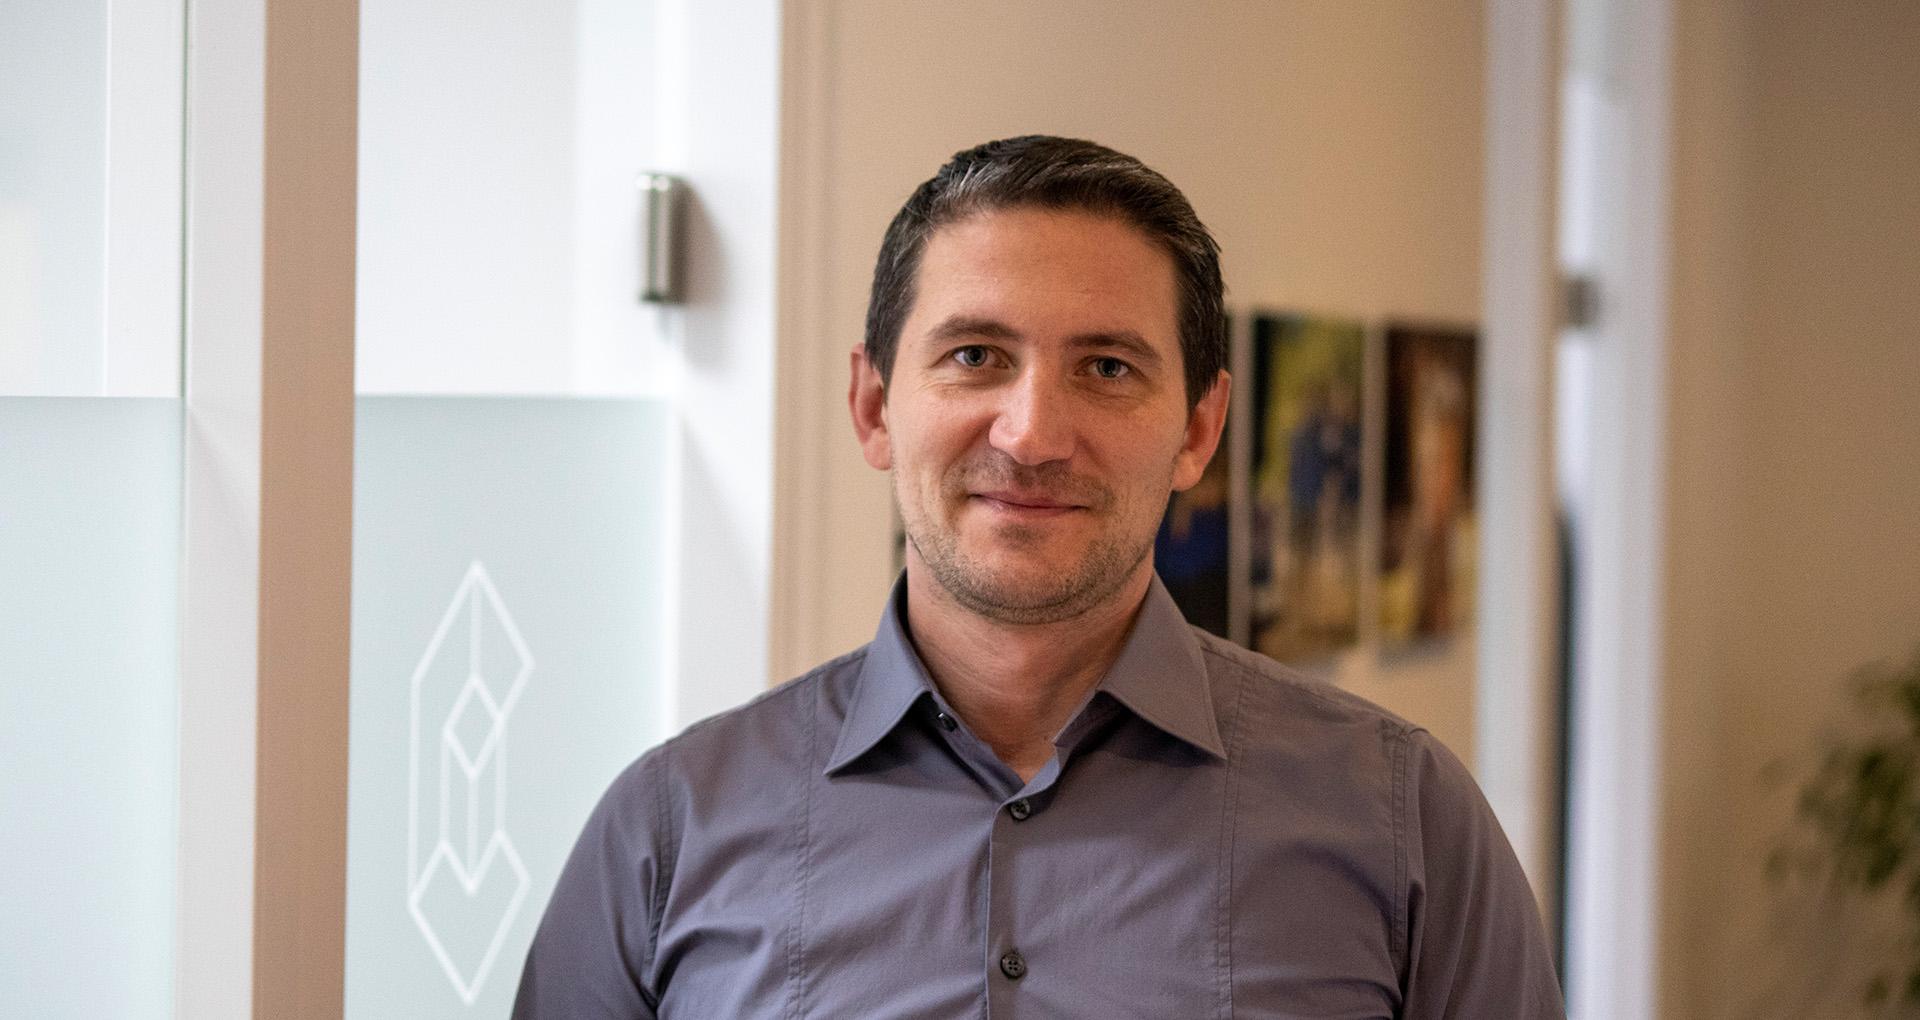 Dimitri Huber, IT-Techniker, Mitarbeiter Cobotec - Bielefeld